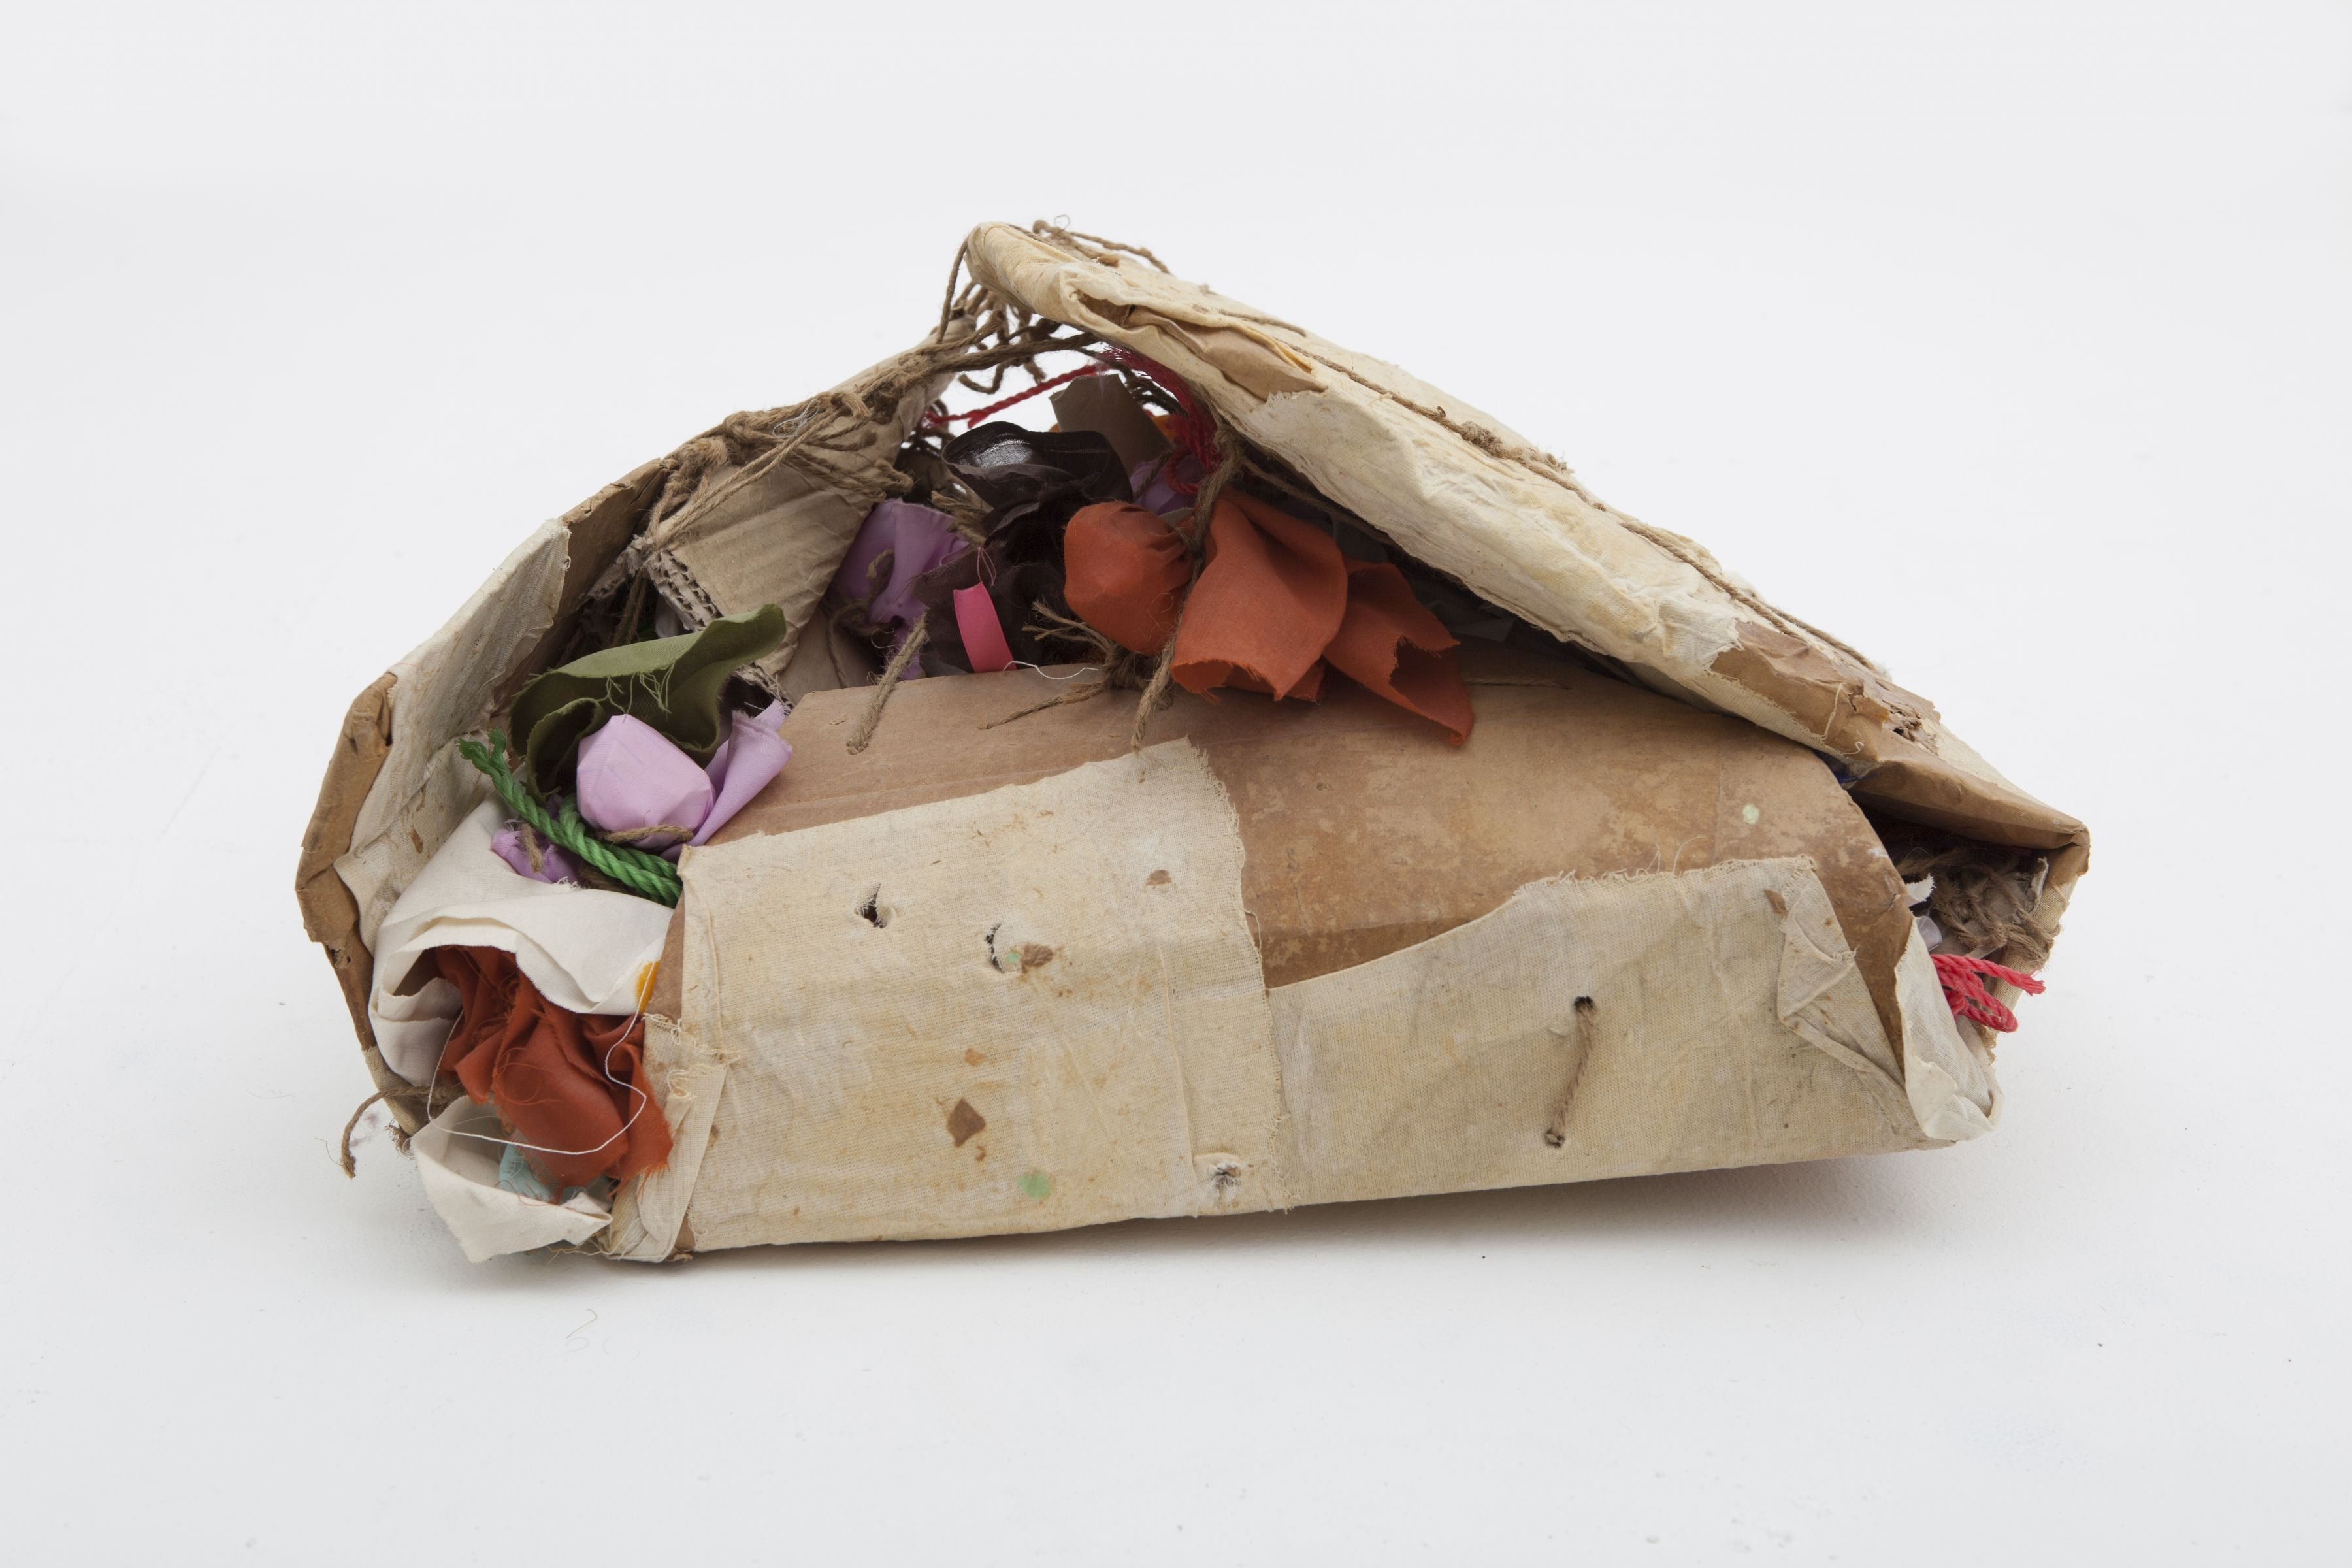 Plastic – Cardboard – Cloth, 2006, Mixed media